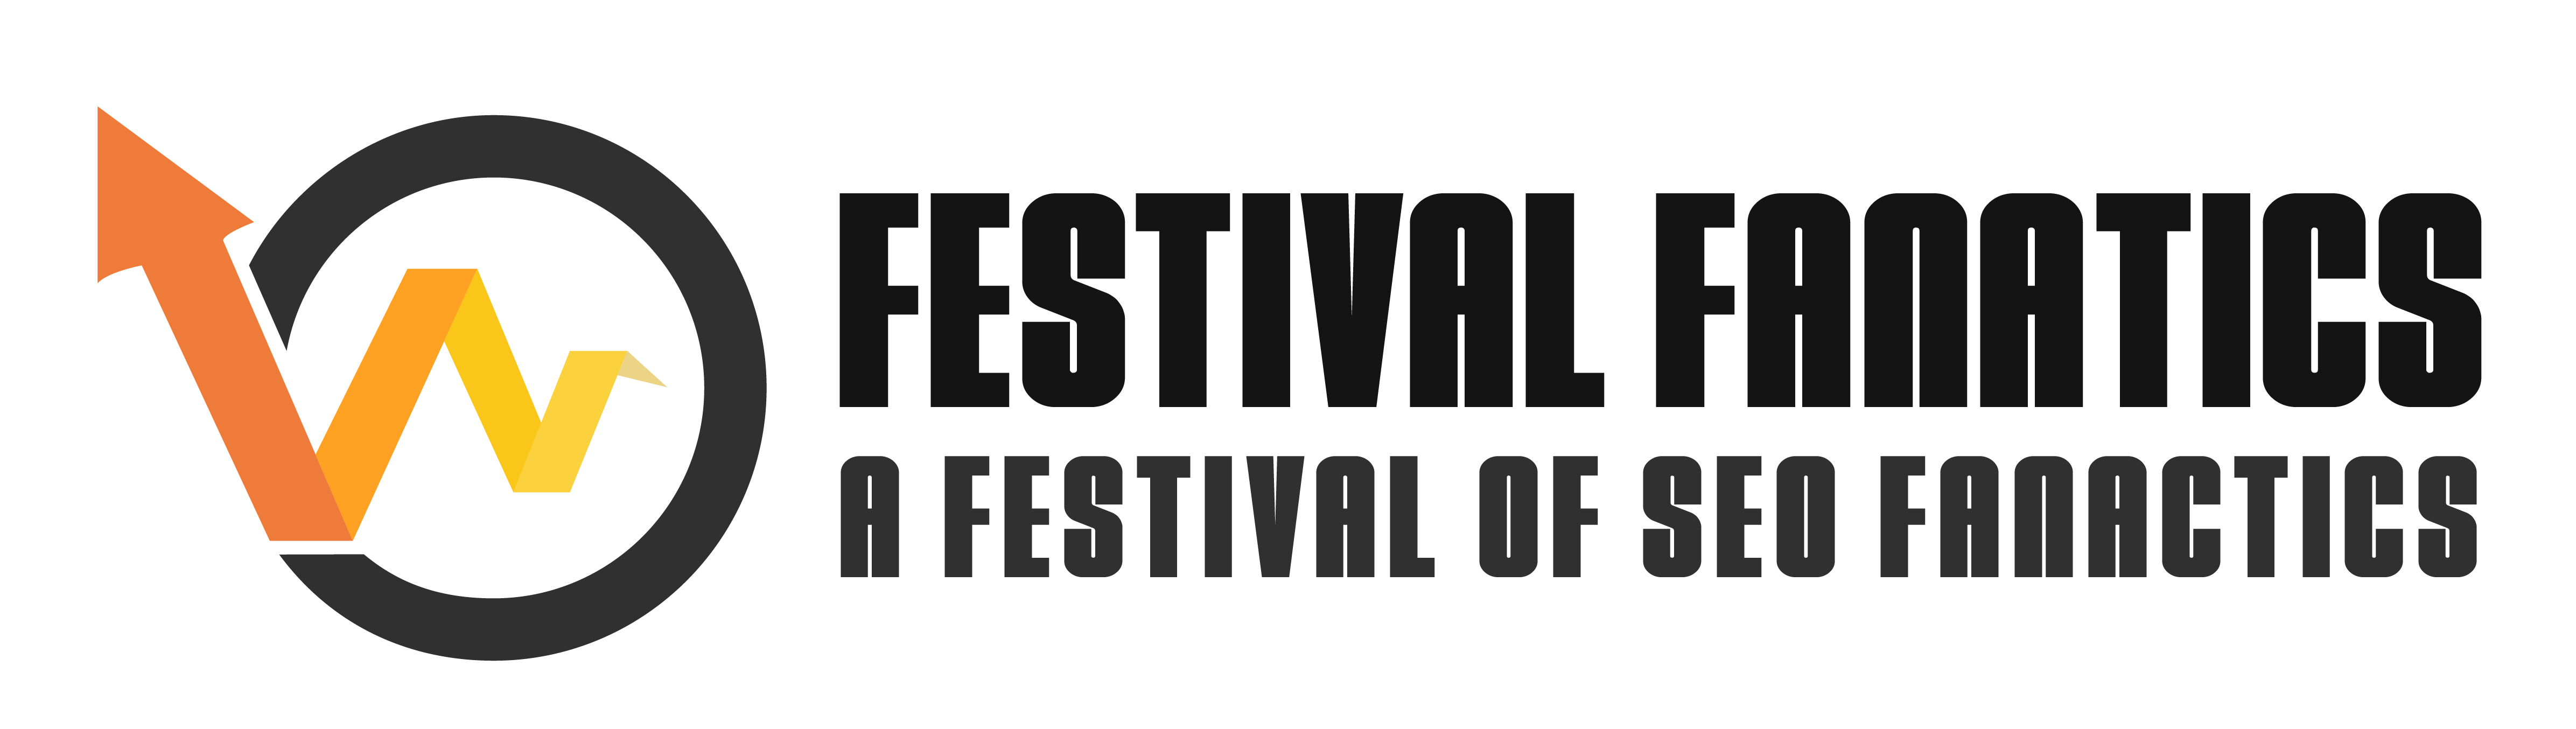 Festival of SEO Fanactics